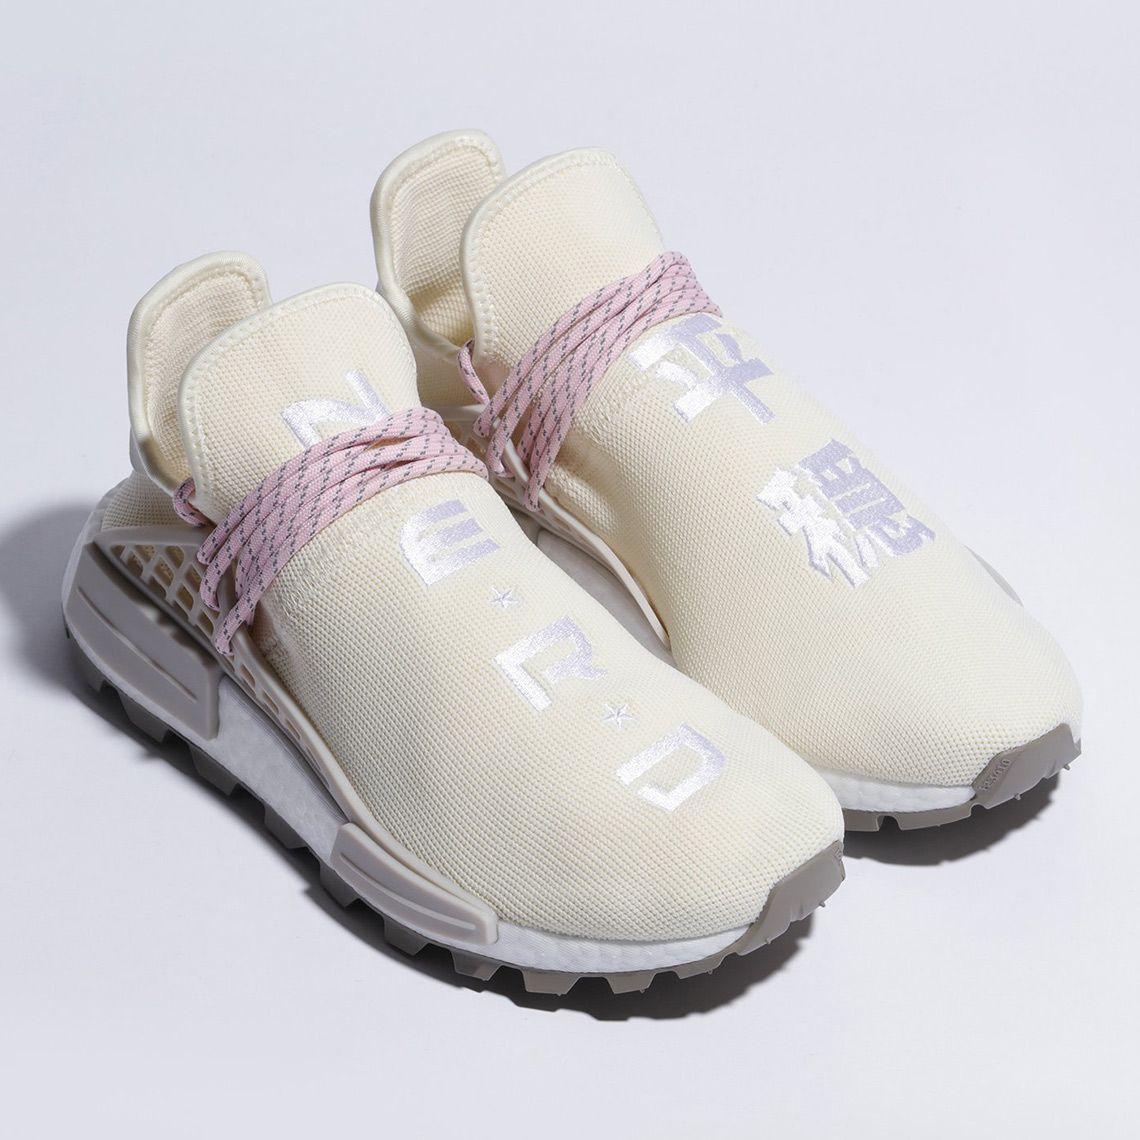 Pharrell adidas NMD Hu NERD Cream White Pink EE8102 | Adidas